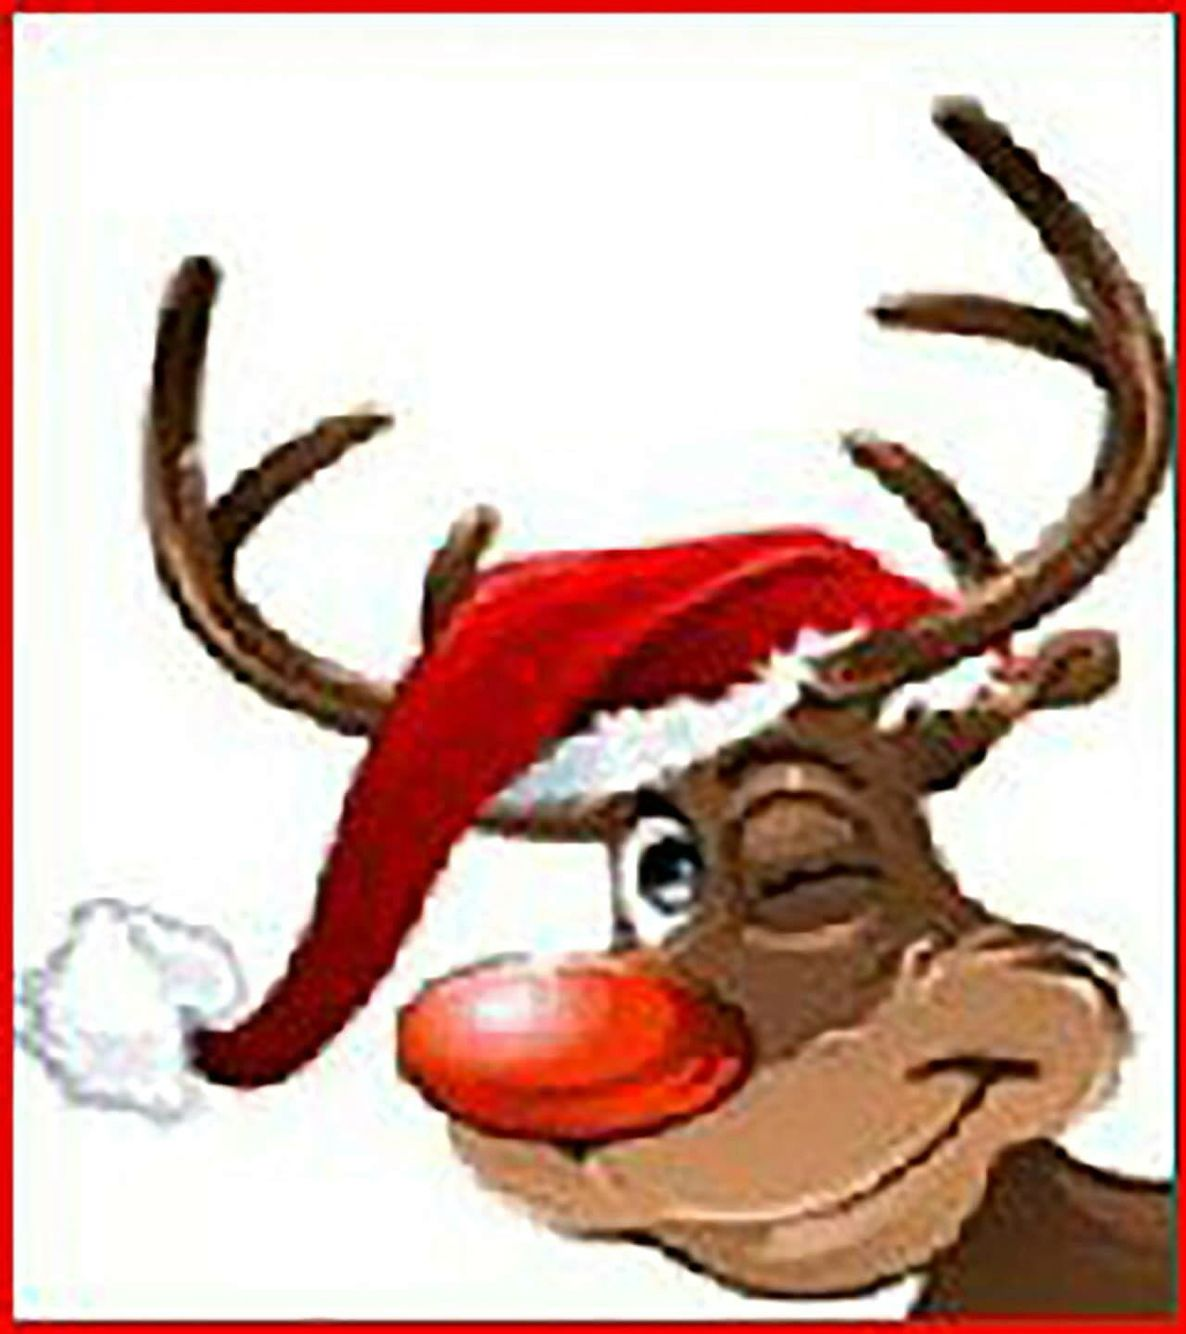 Image by Kim Principale on Very Cool Christmas jokes